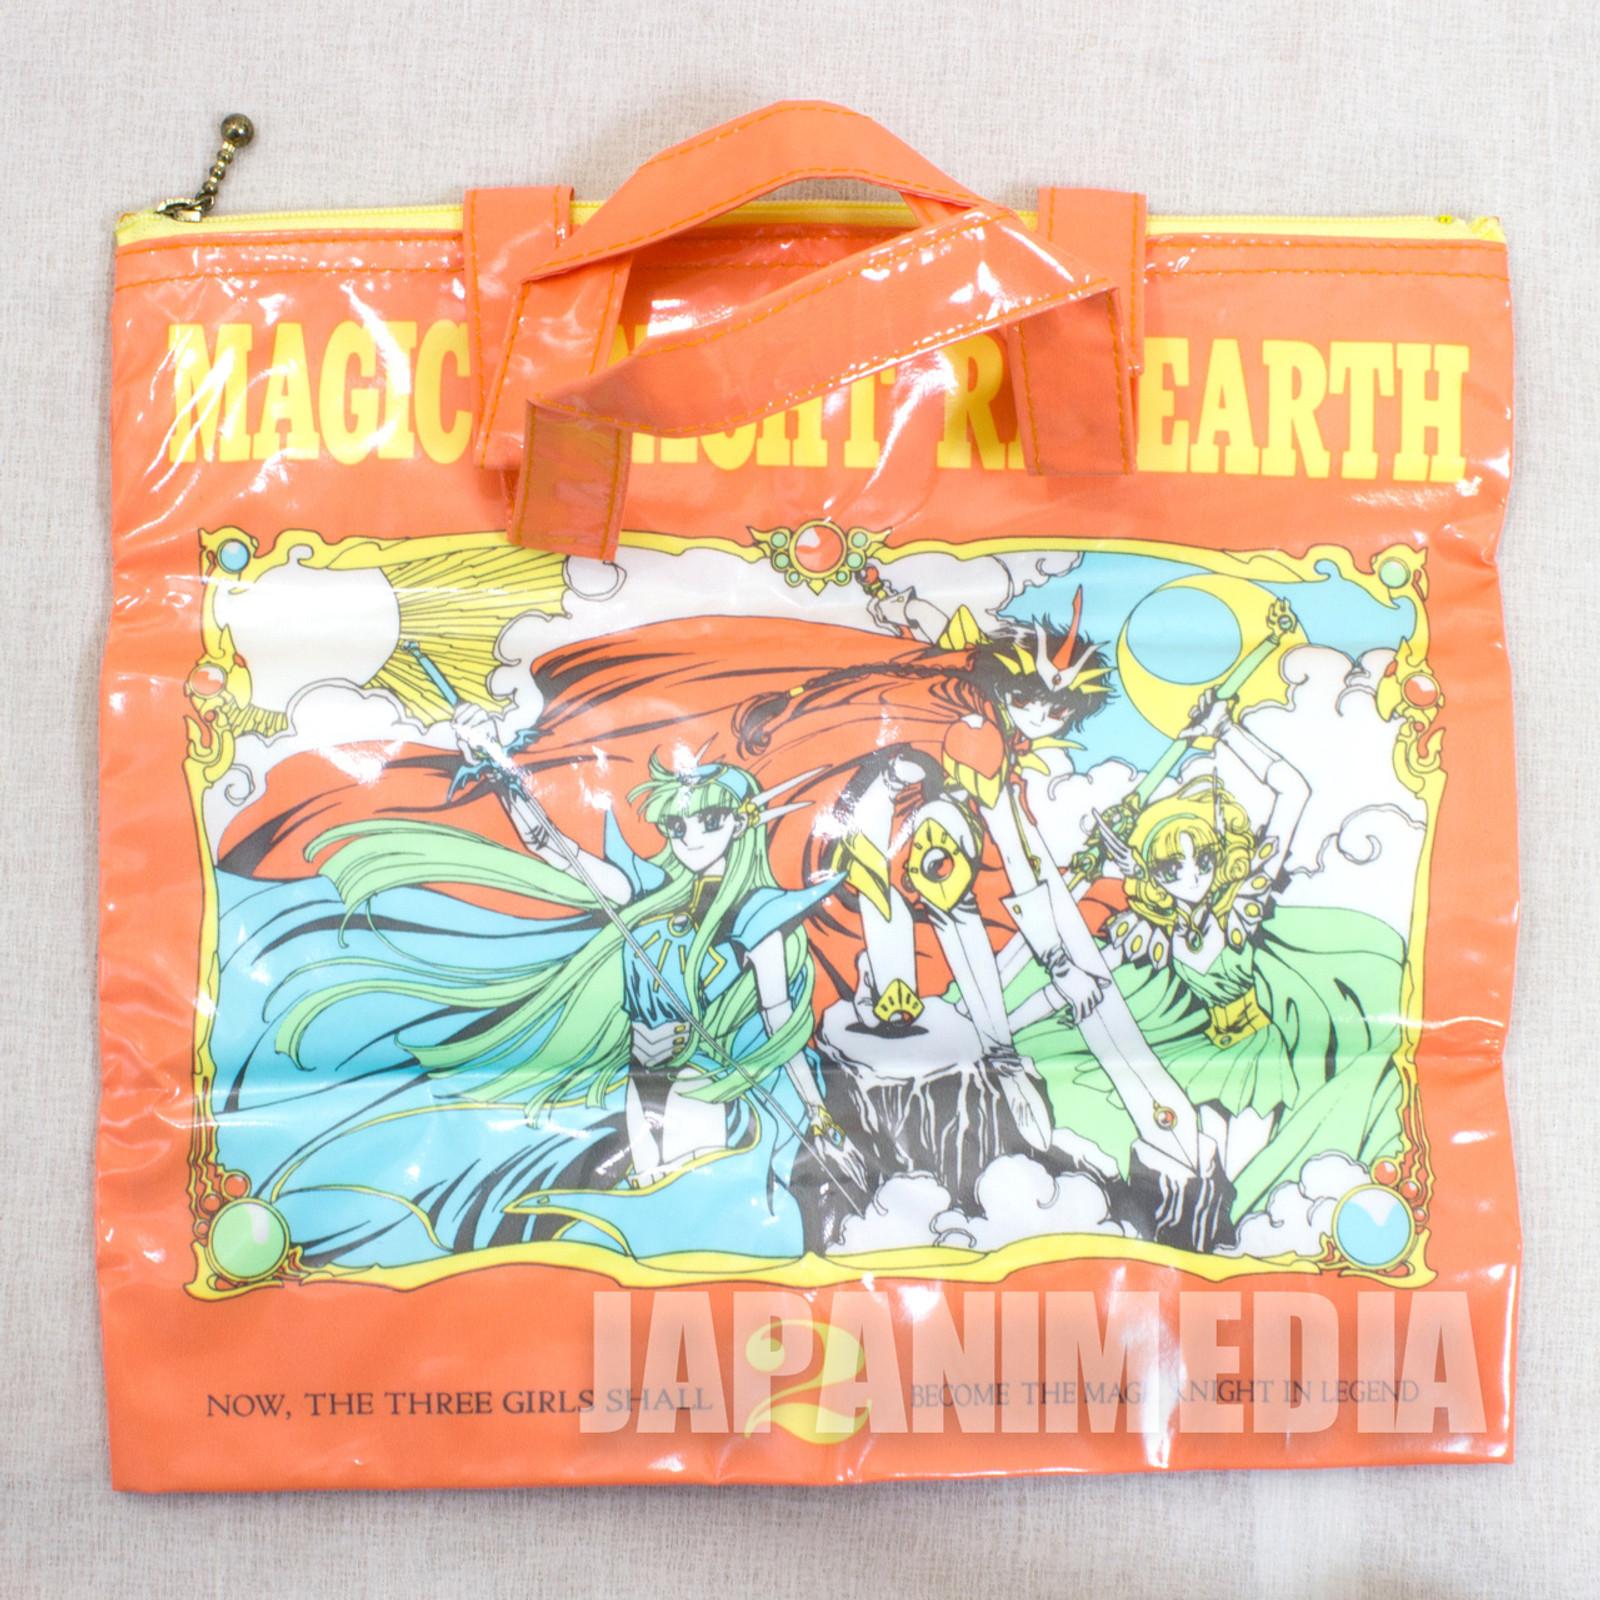 Magic Knight Rayearth Orange Vinyl Bag CLAMP Nakayoshi JAPAN ANIME